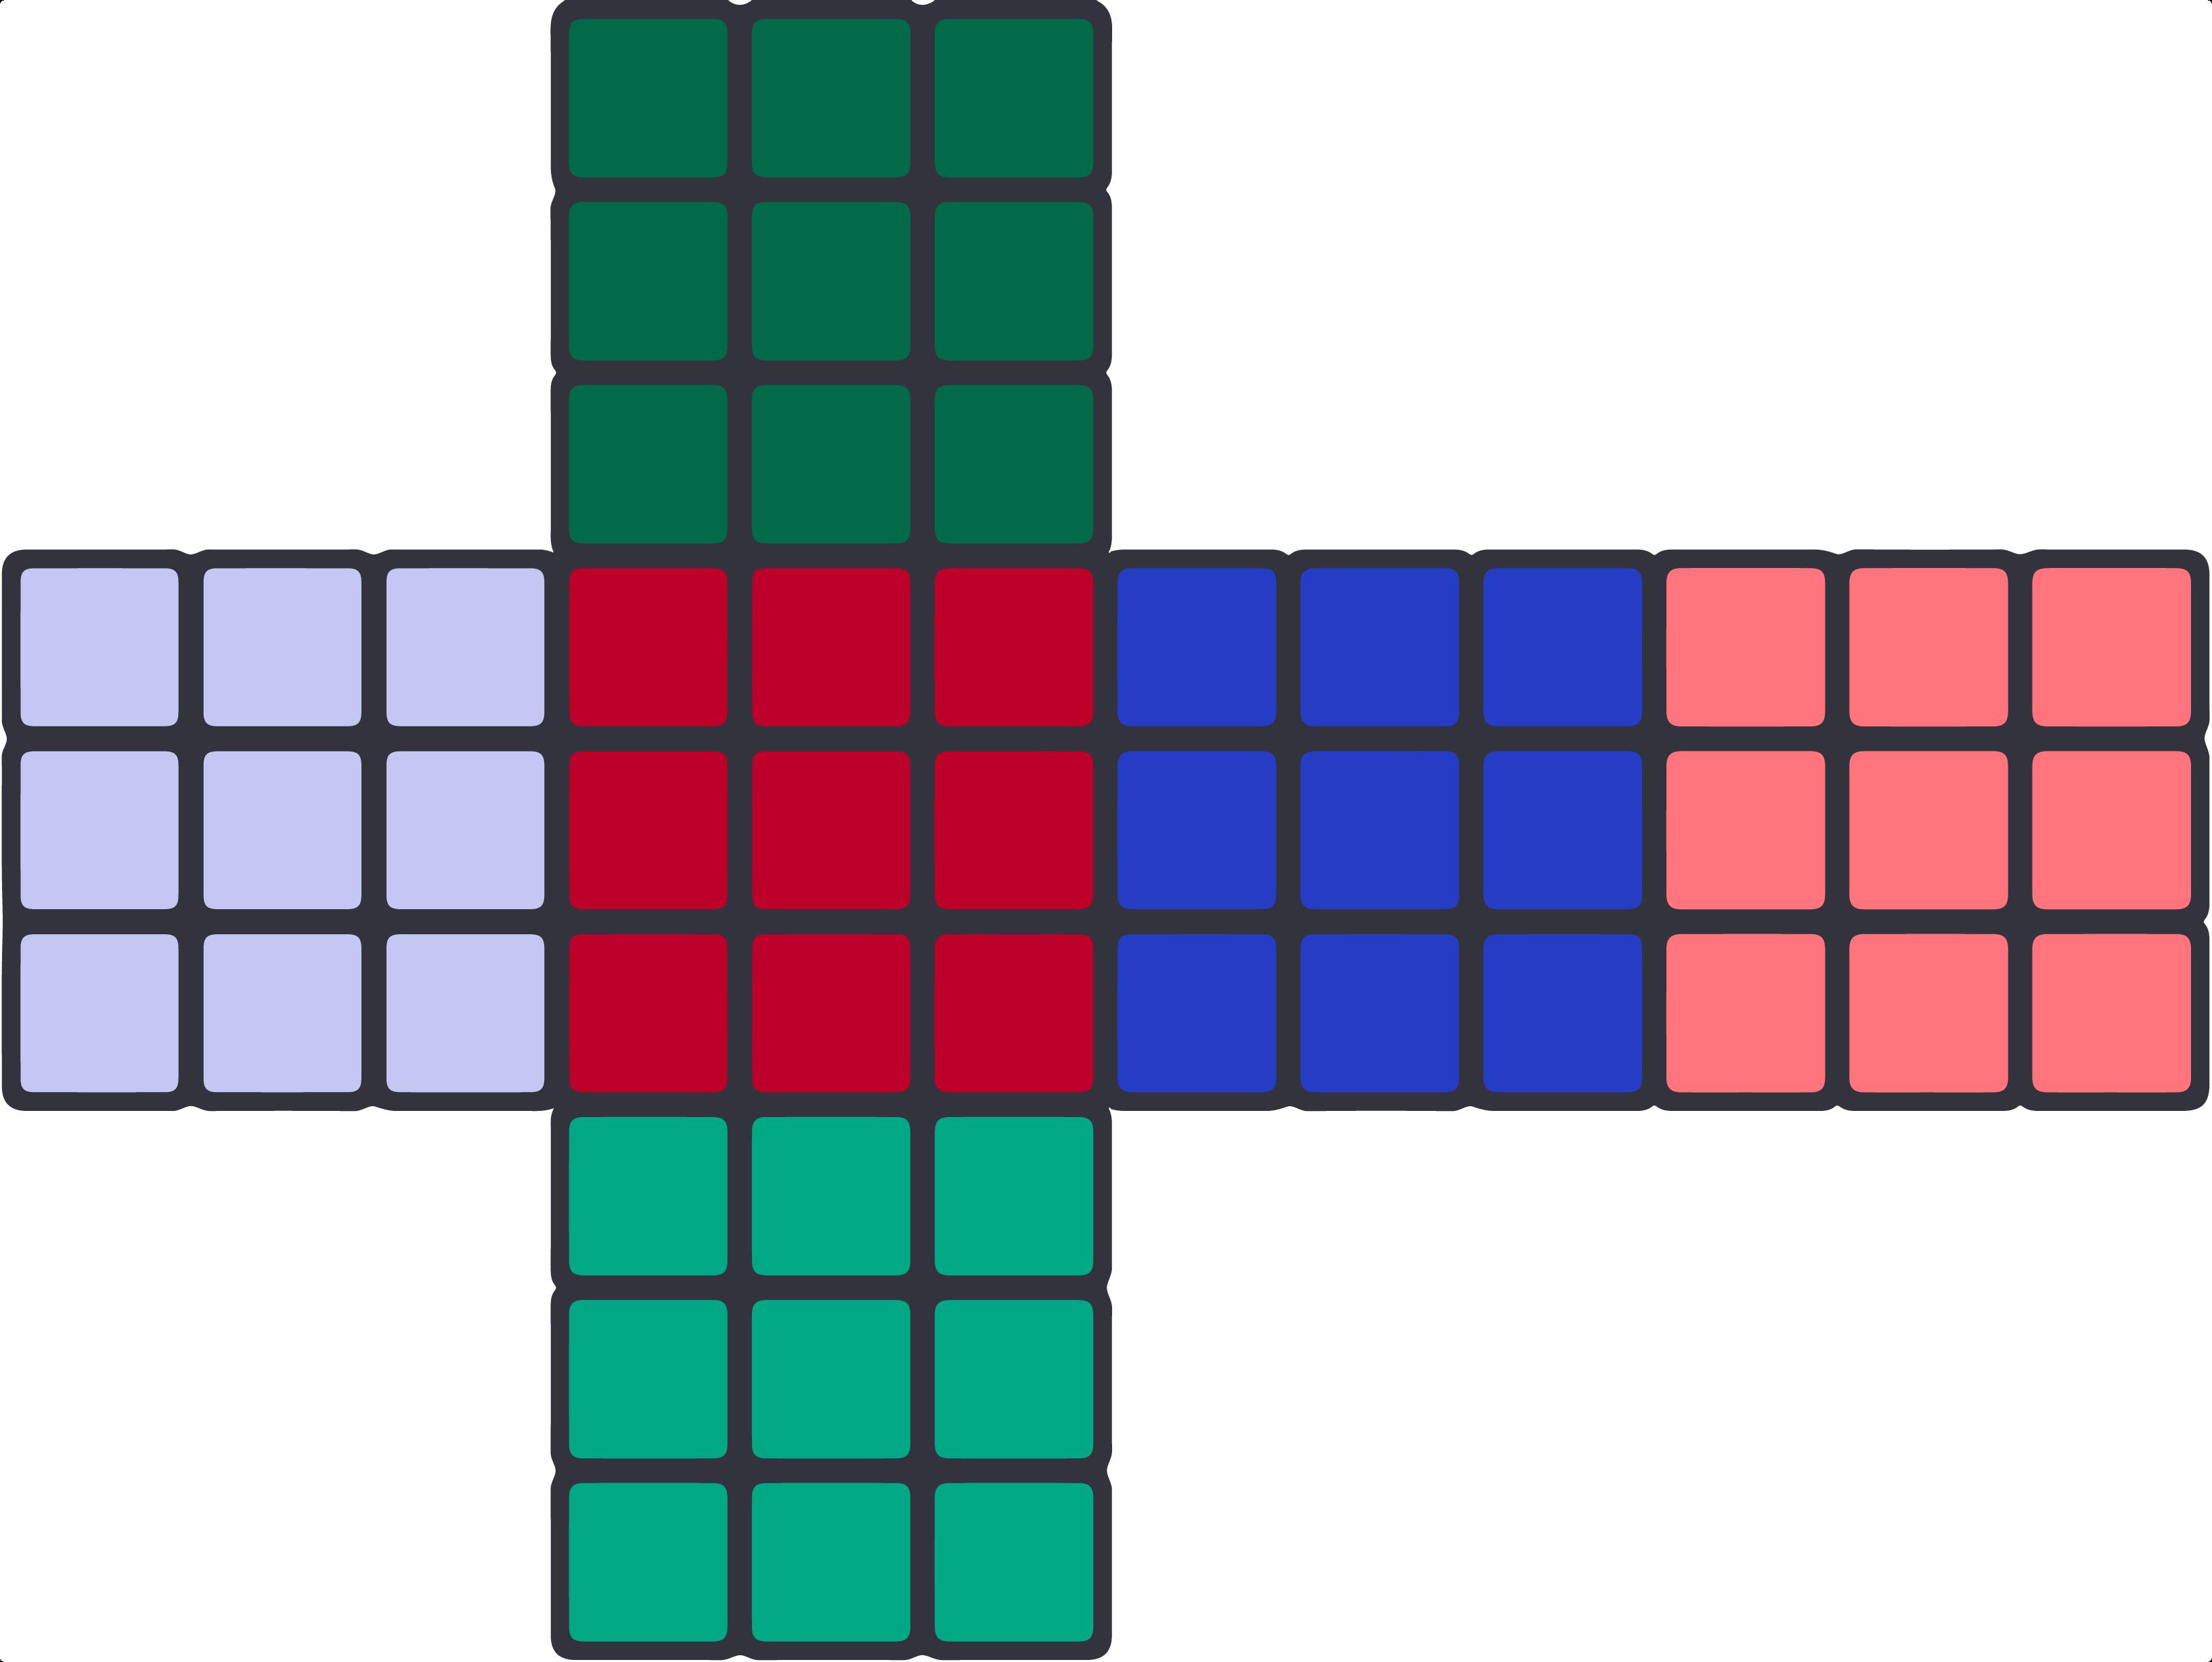 https://petljamediastorage.blob.core.windows.net/root/Media/Default/Kursevi/OnlineNastava/7_razred_IKT_DigitalnaPismenost/L73S2.png